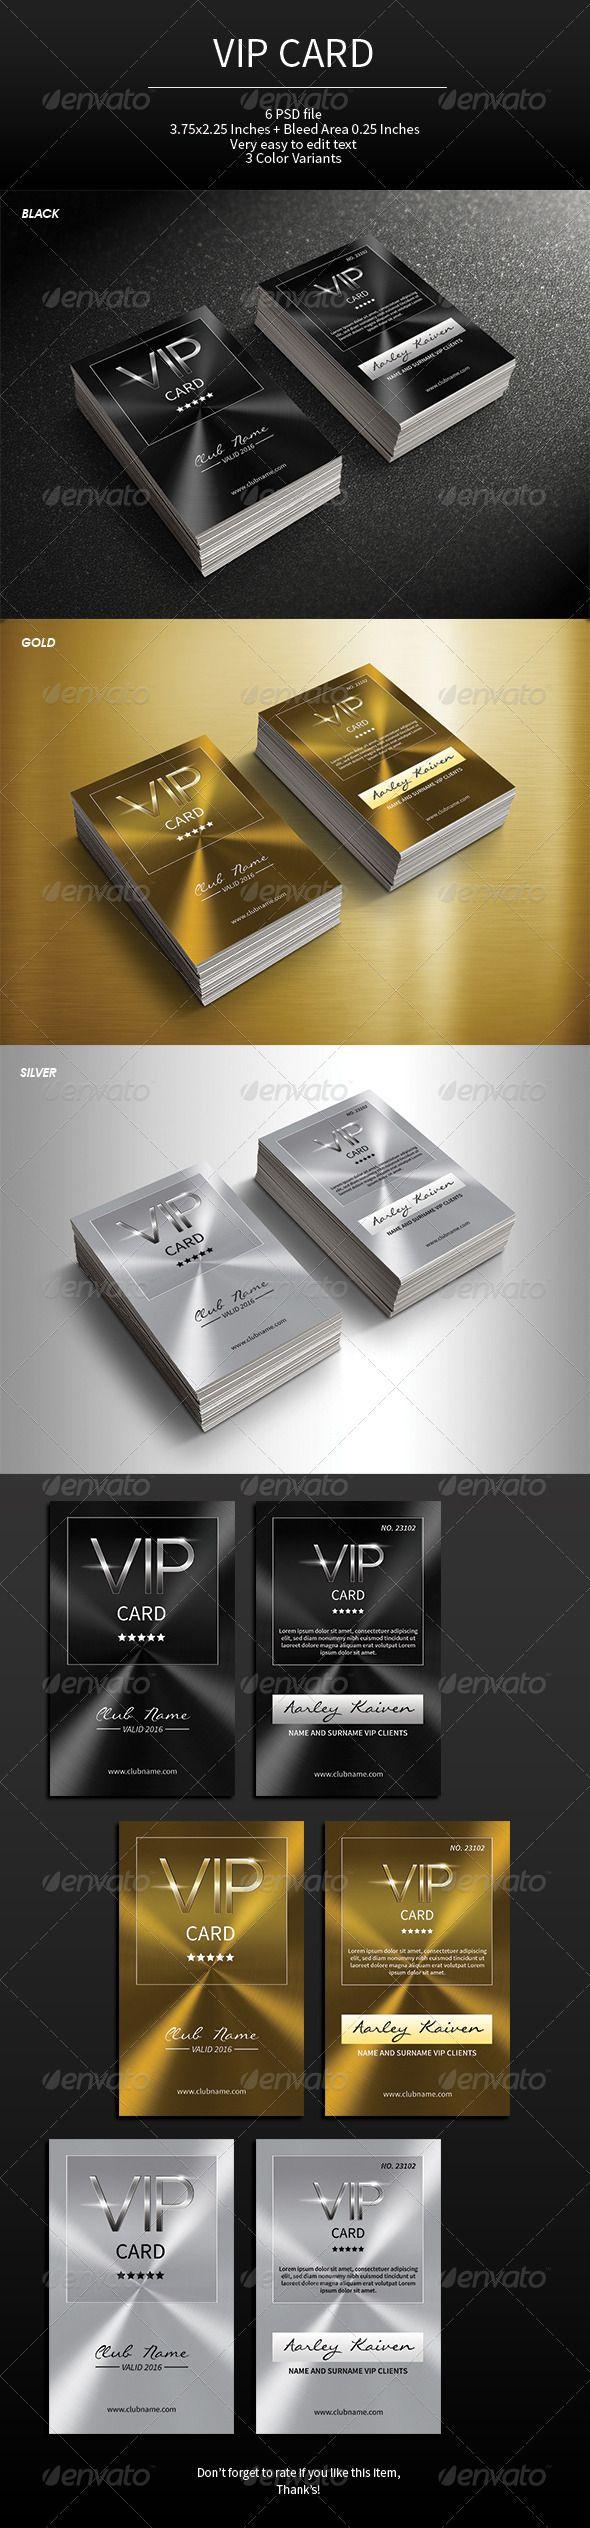 Multipurpose vip card vip card psd templates and business company multipurpose vip card reheart Choice Image